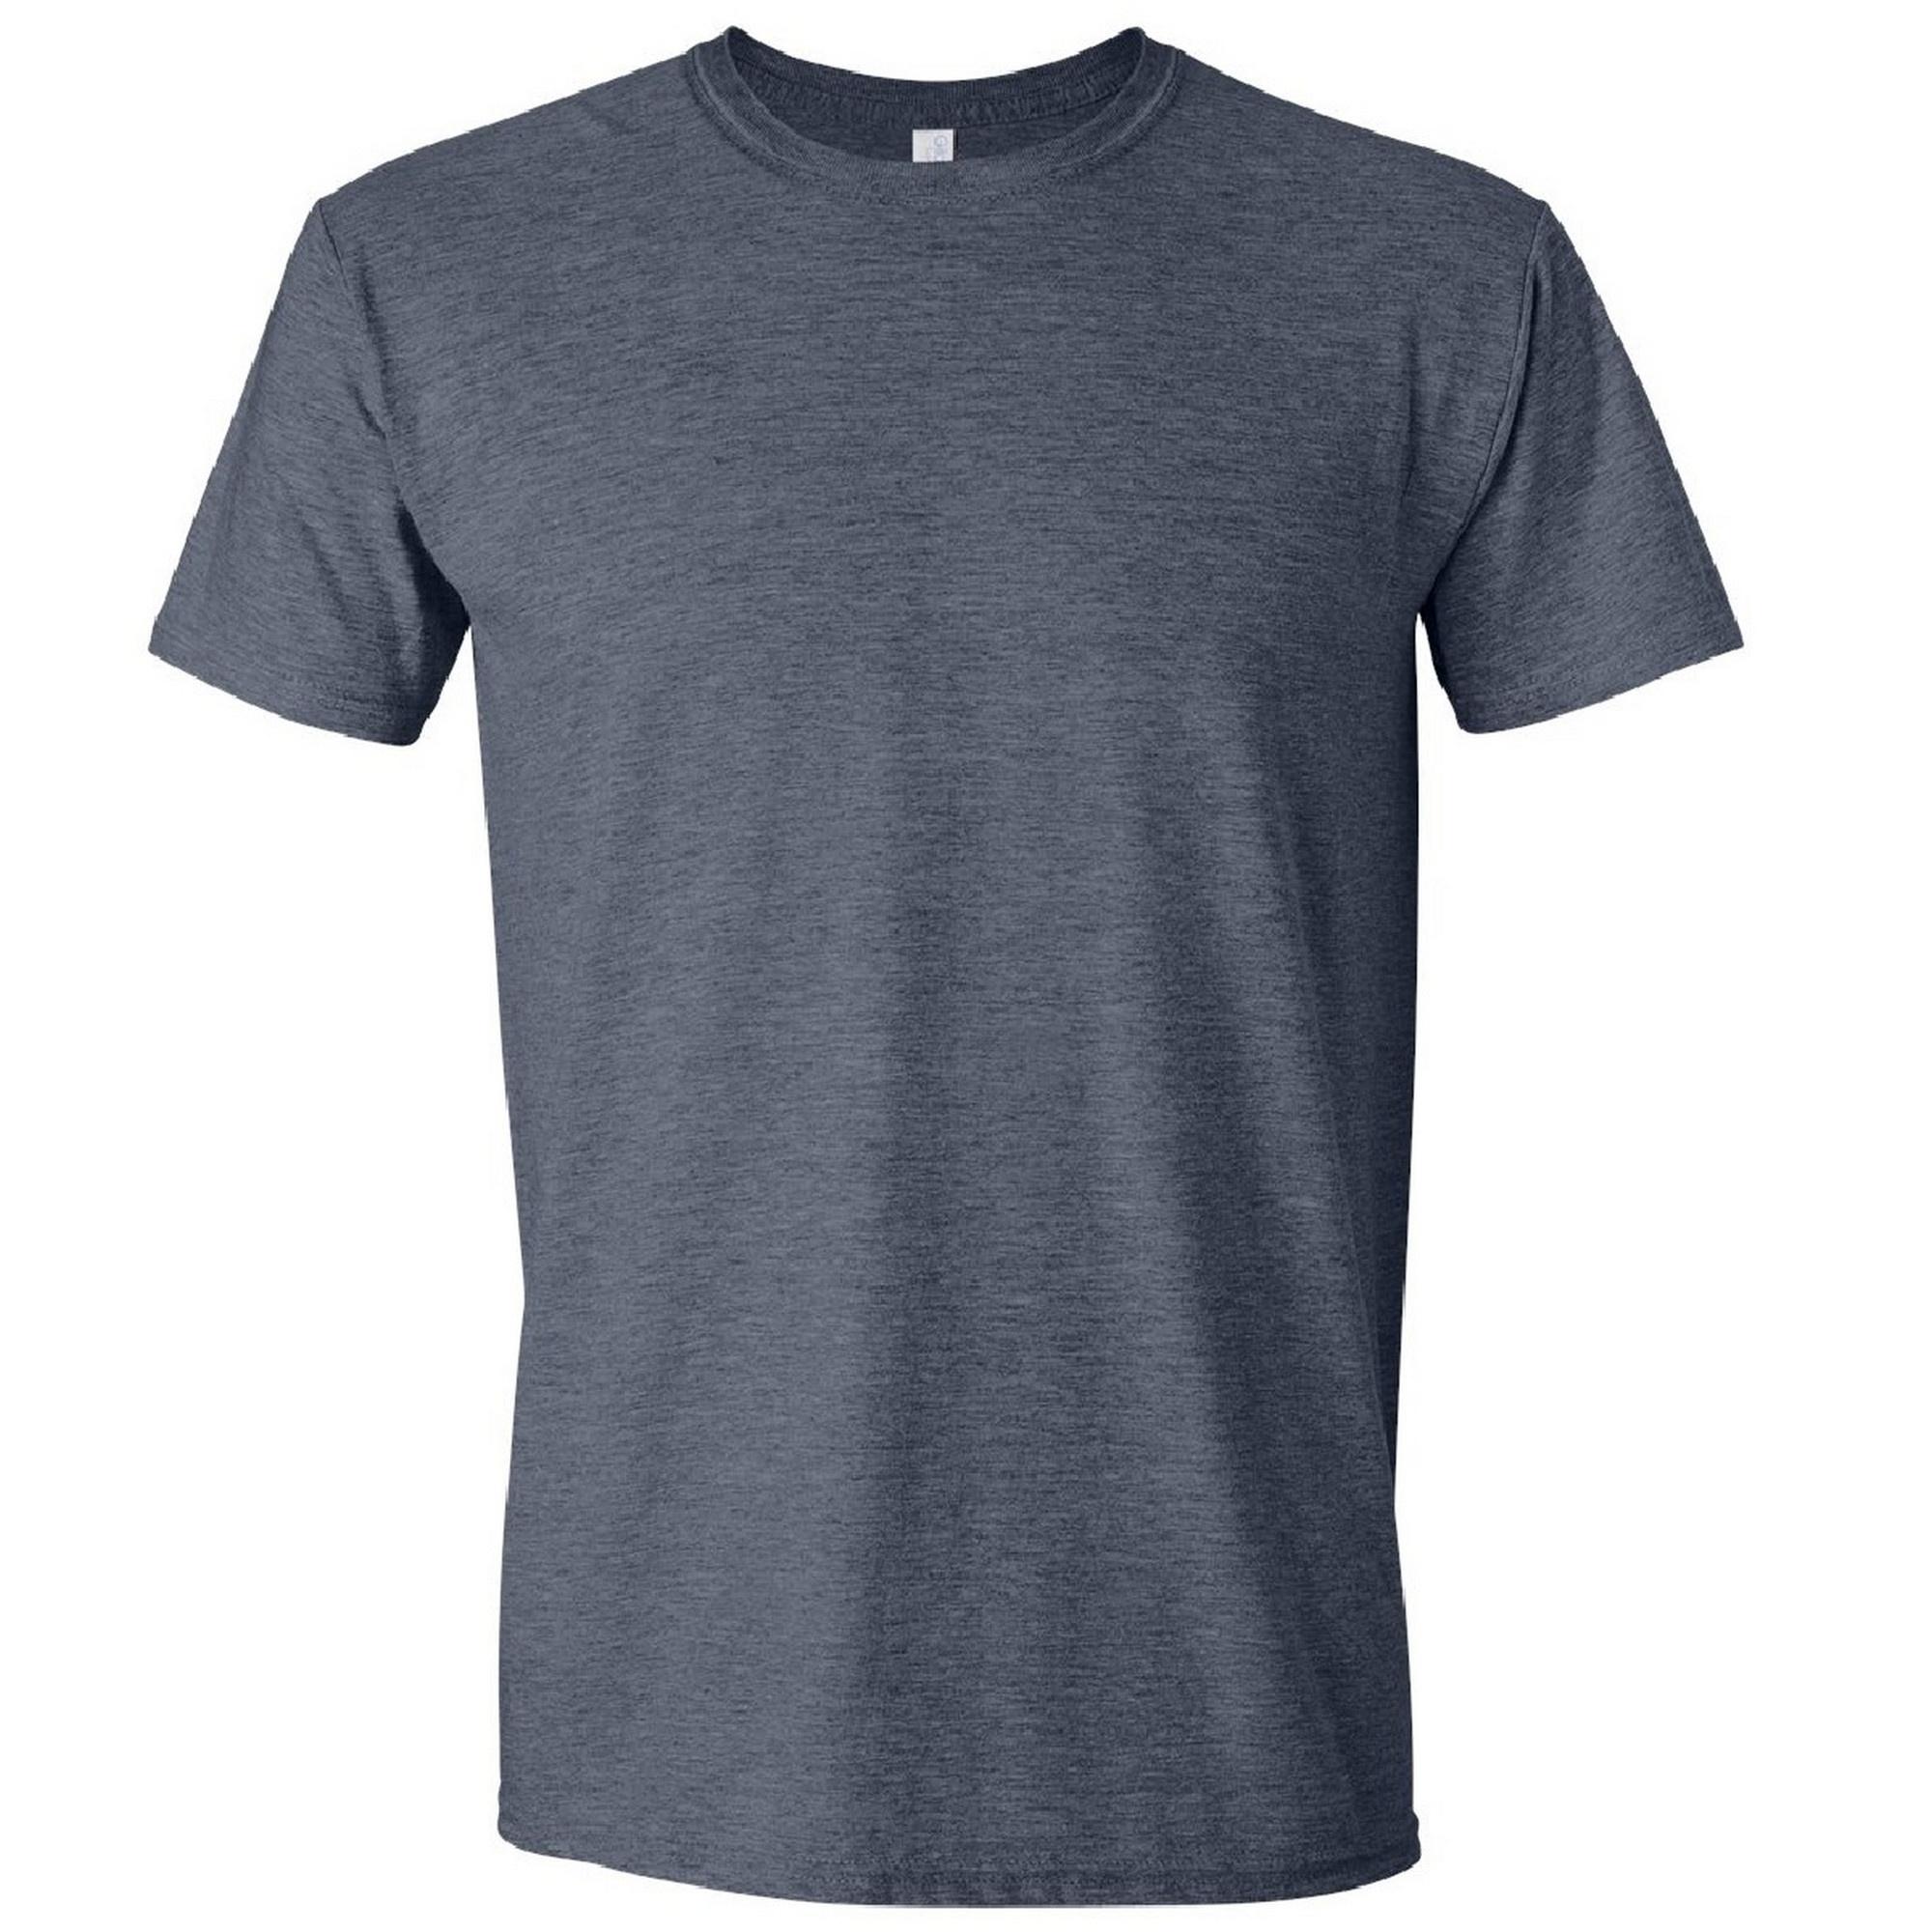 Gildan Mens Short Sleeve Soft-Style T-Shirt (S) (Heather Cardinal)